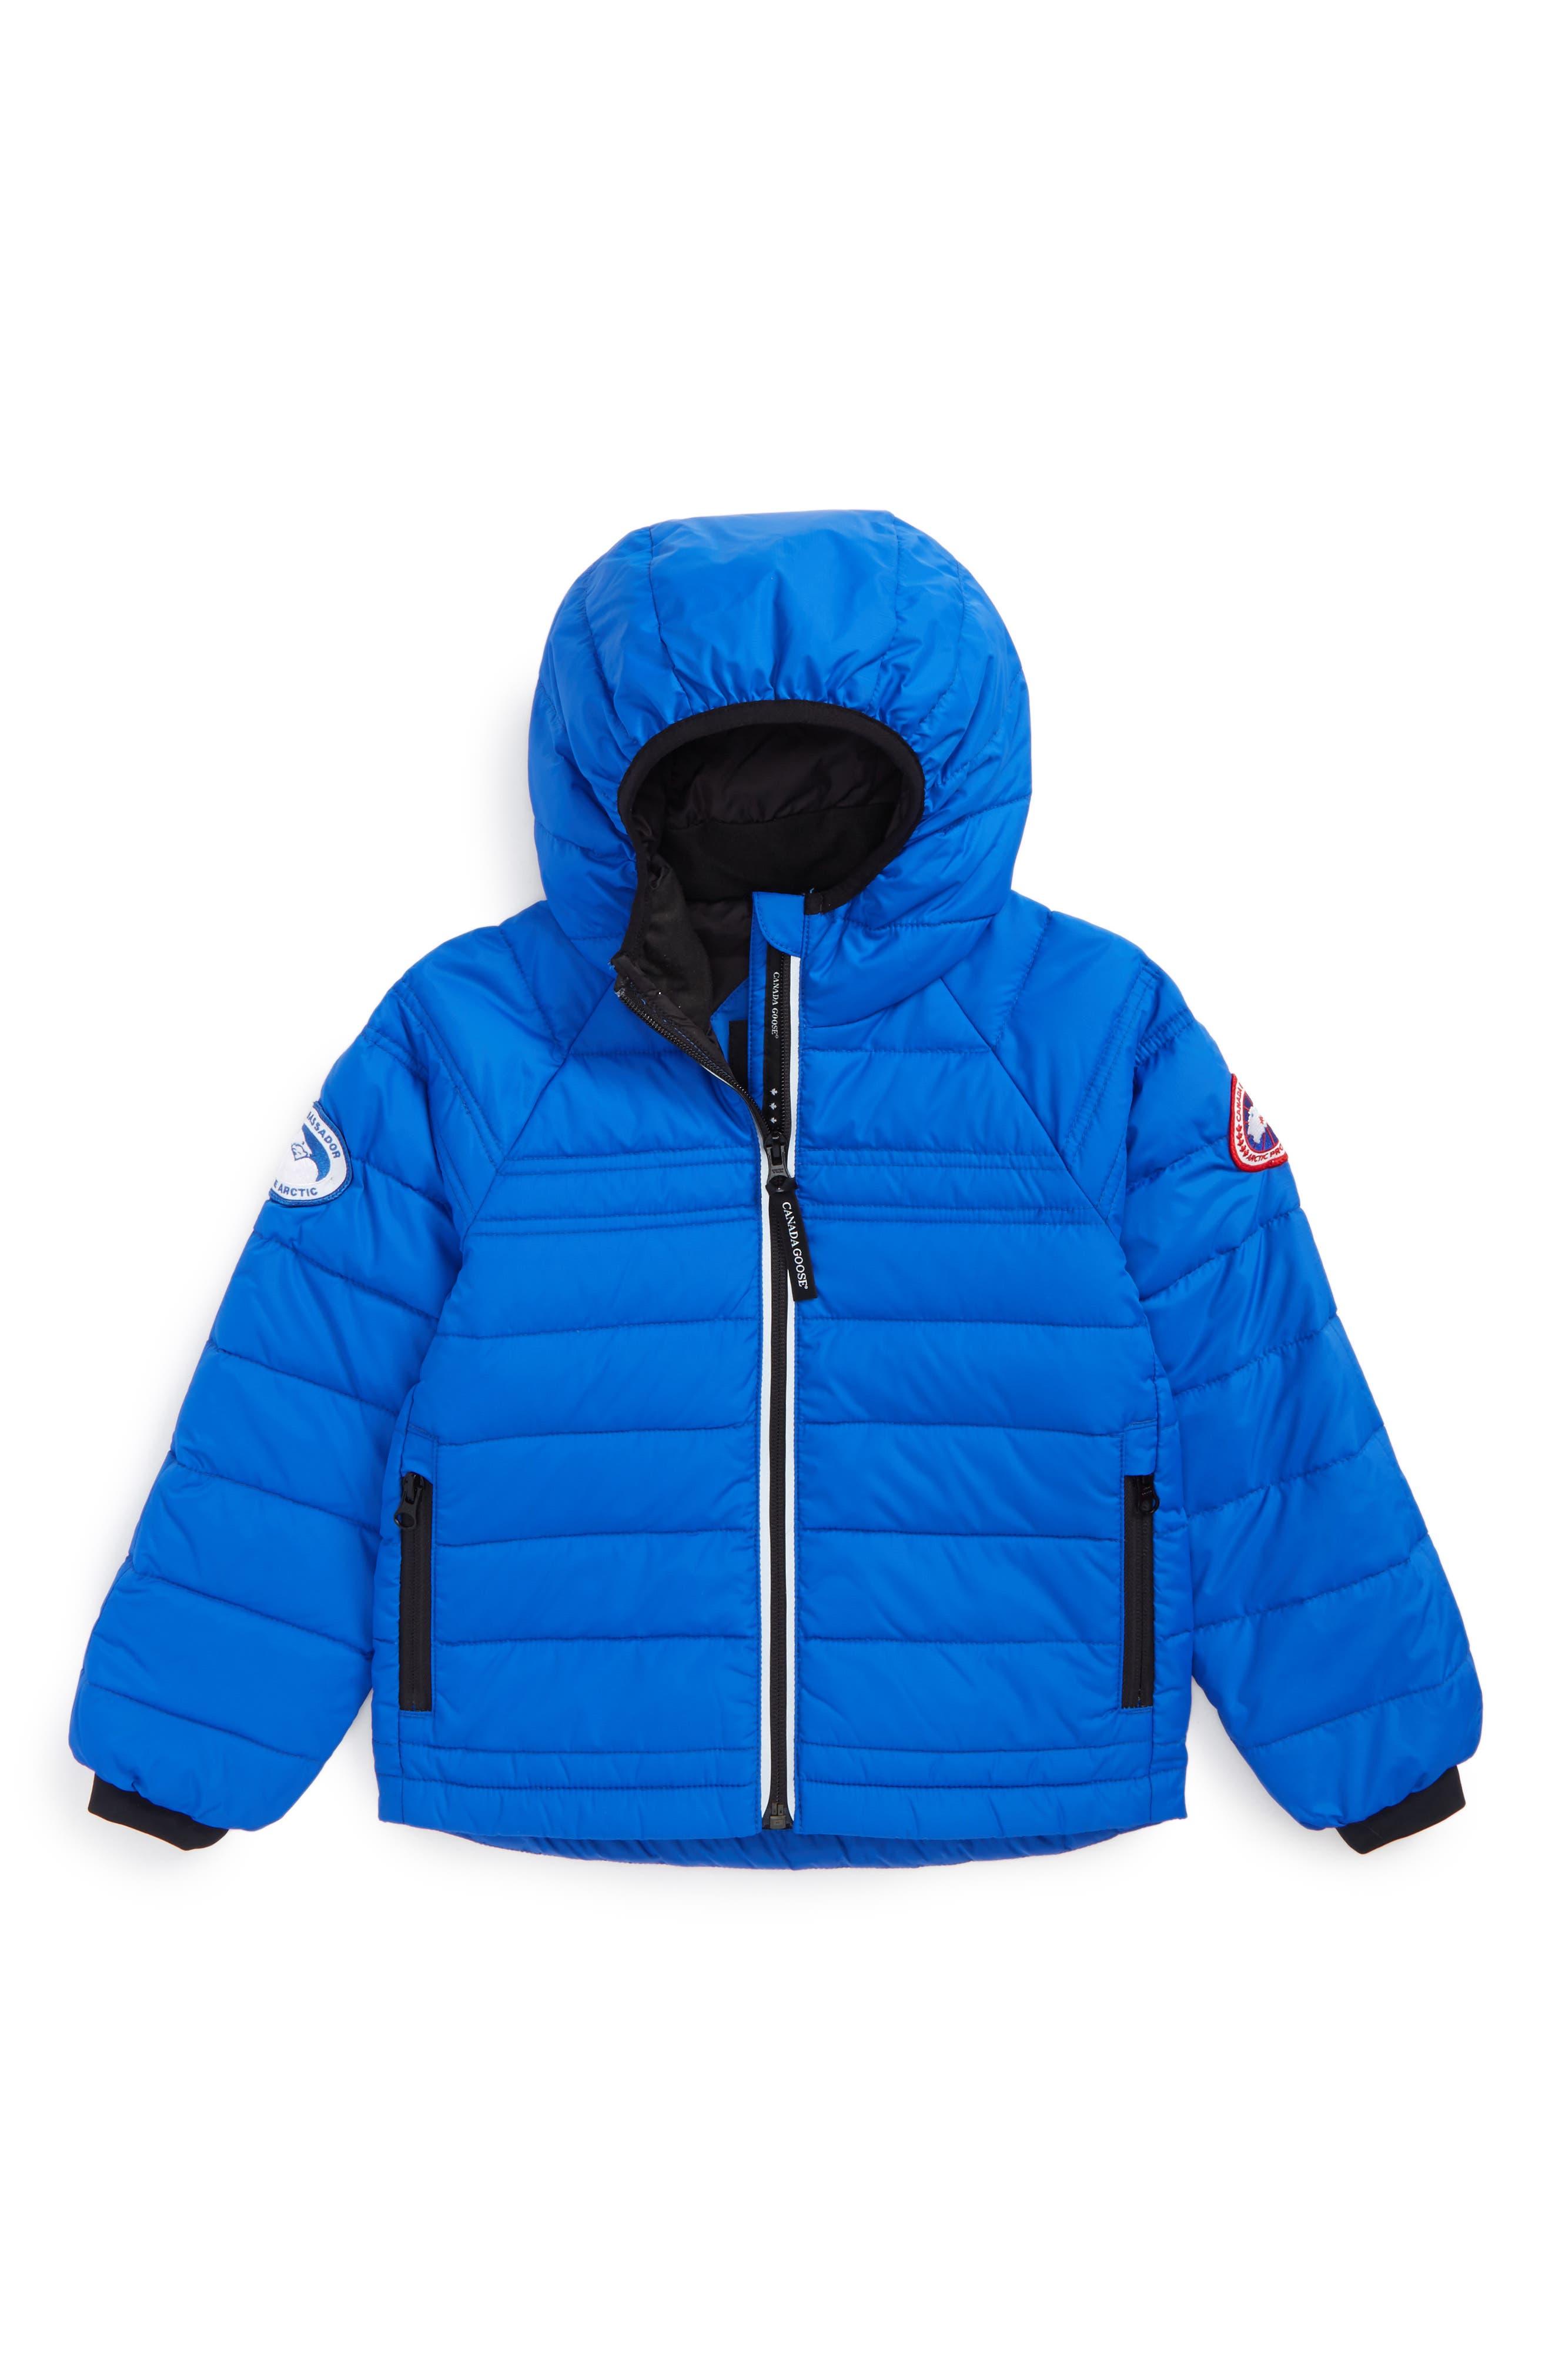 Bobcat Water Resistant Hooded Down Jacket,                             Main thumbnail 1, color,                             PBI BLUE